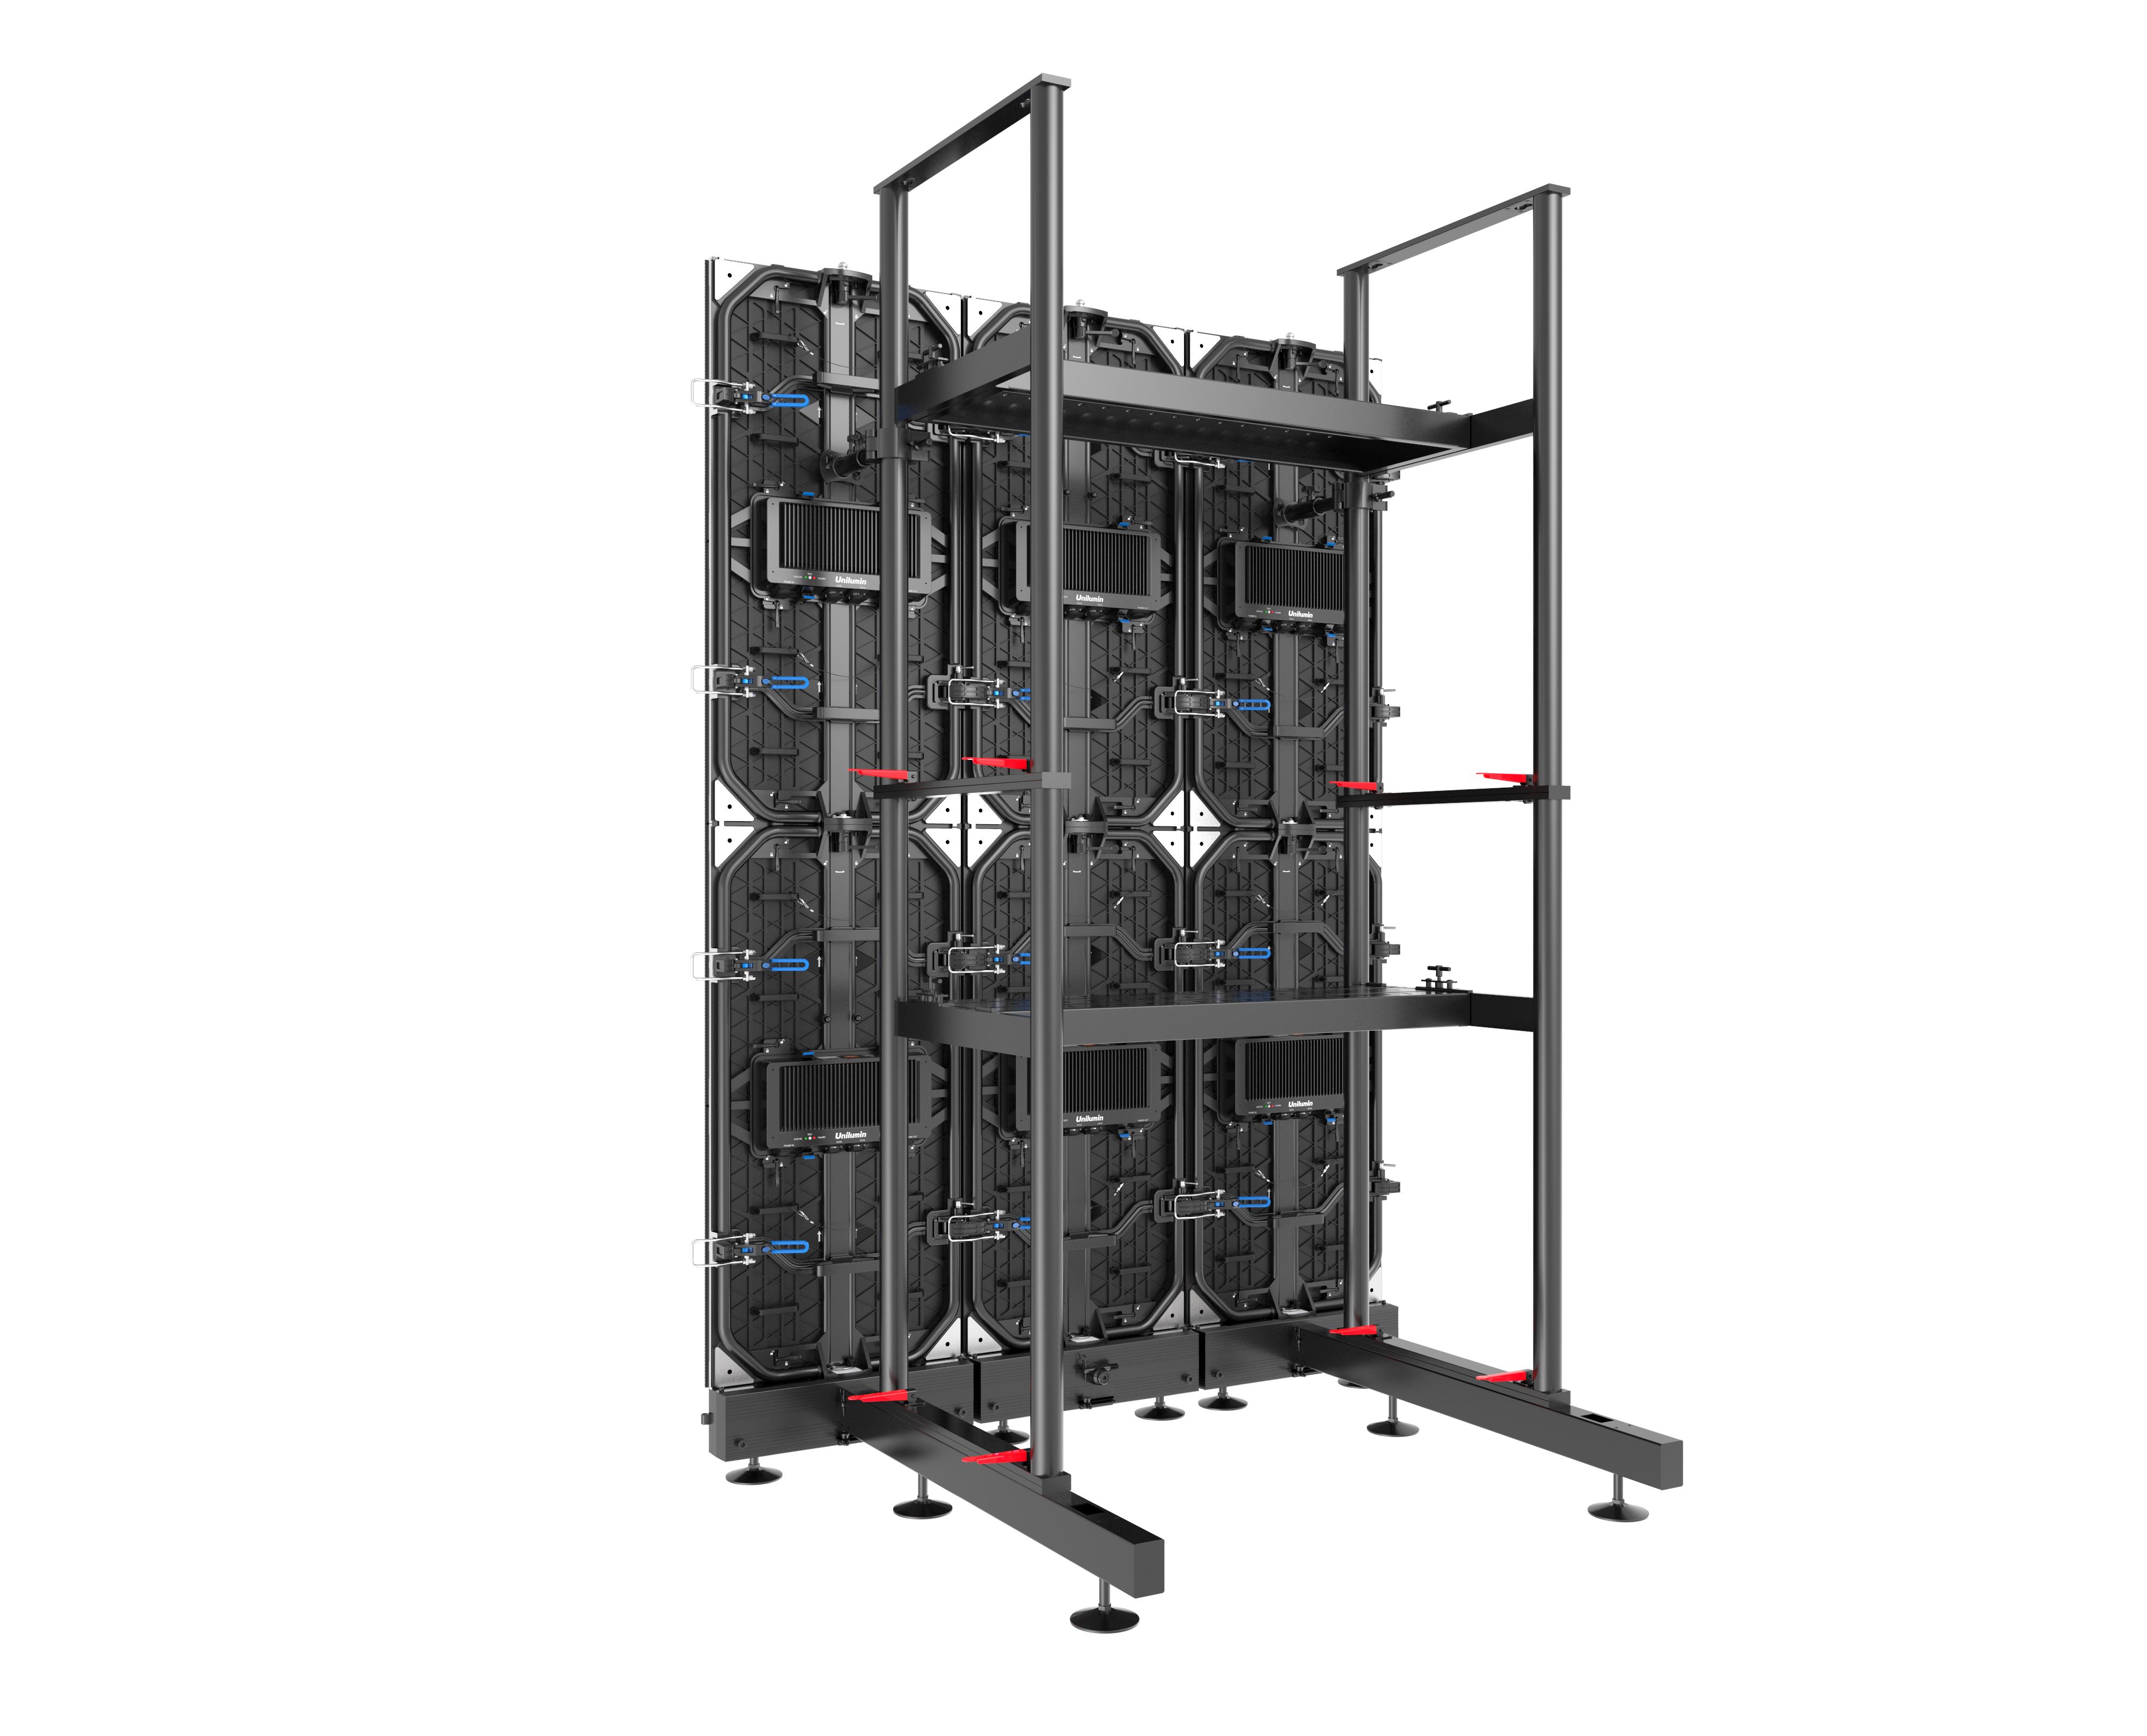 UTILE 3 rental led virtual production install